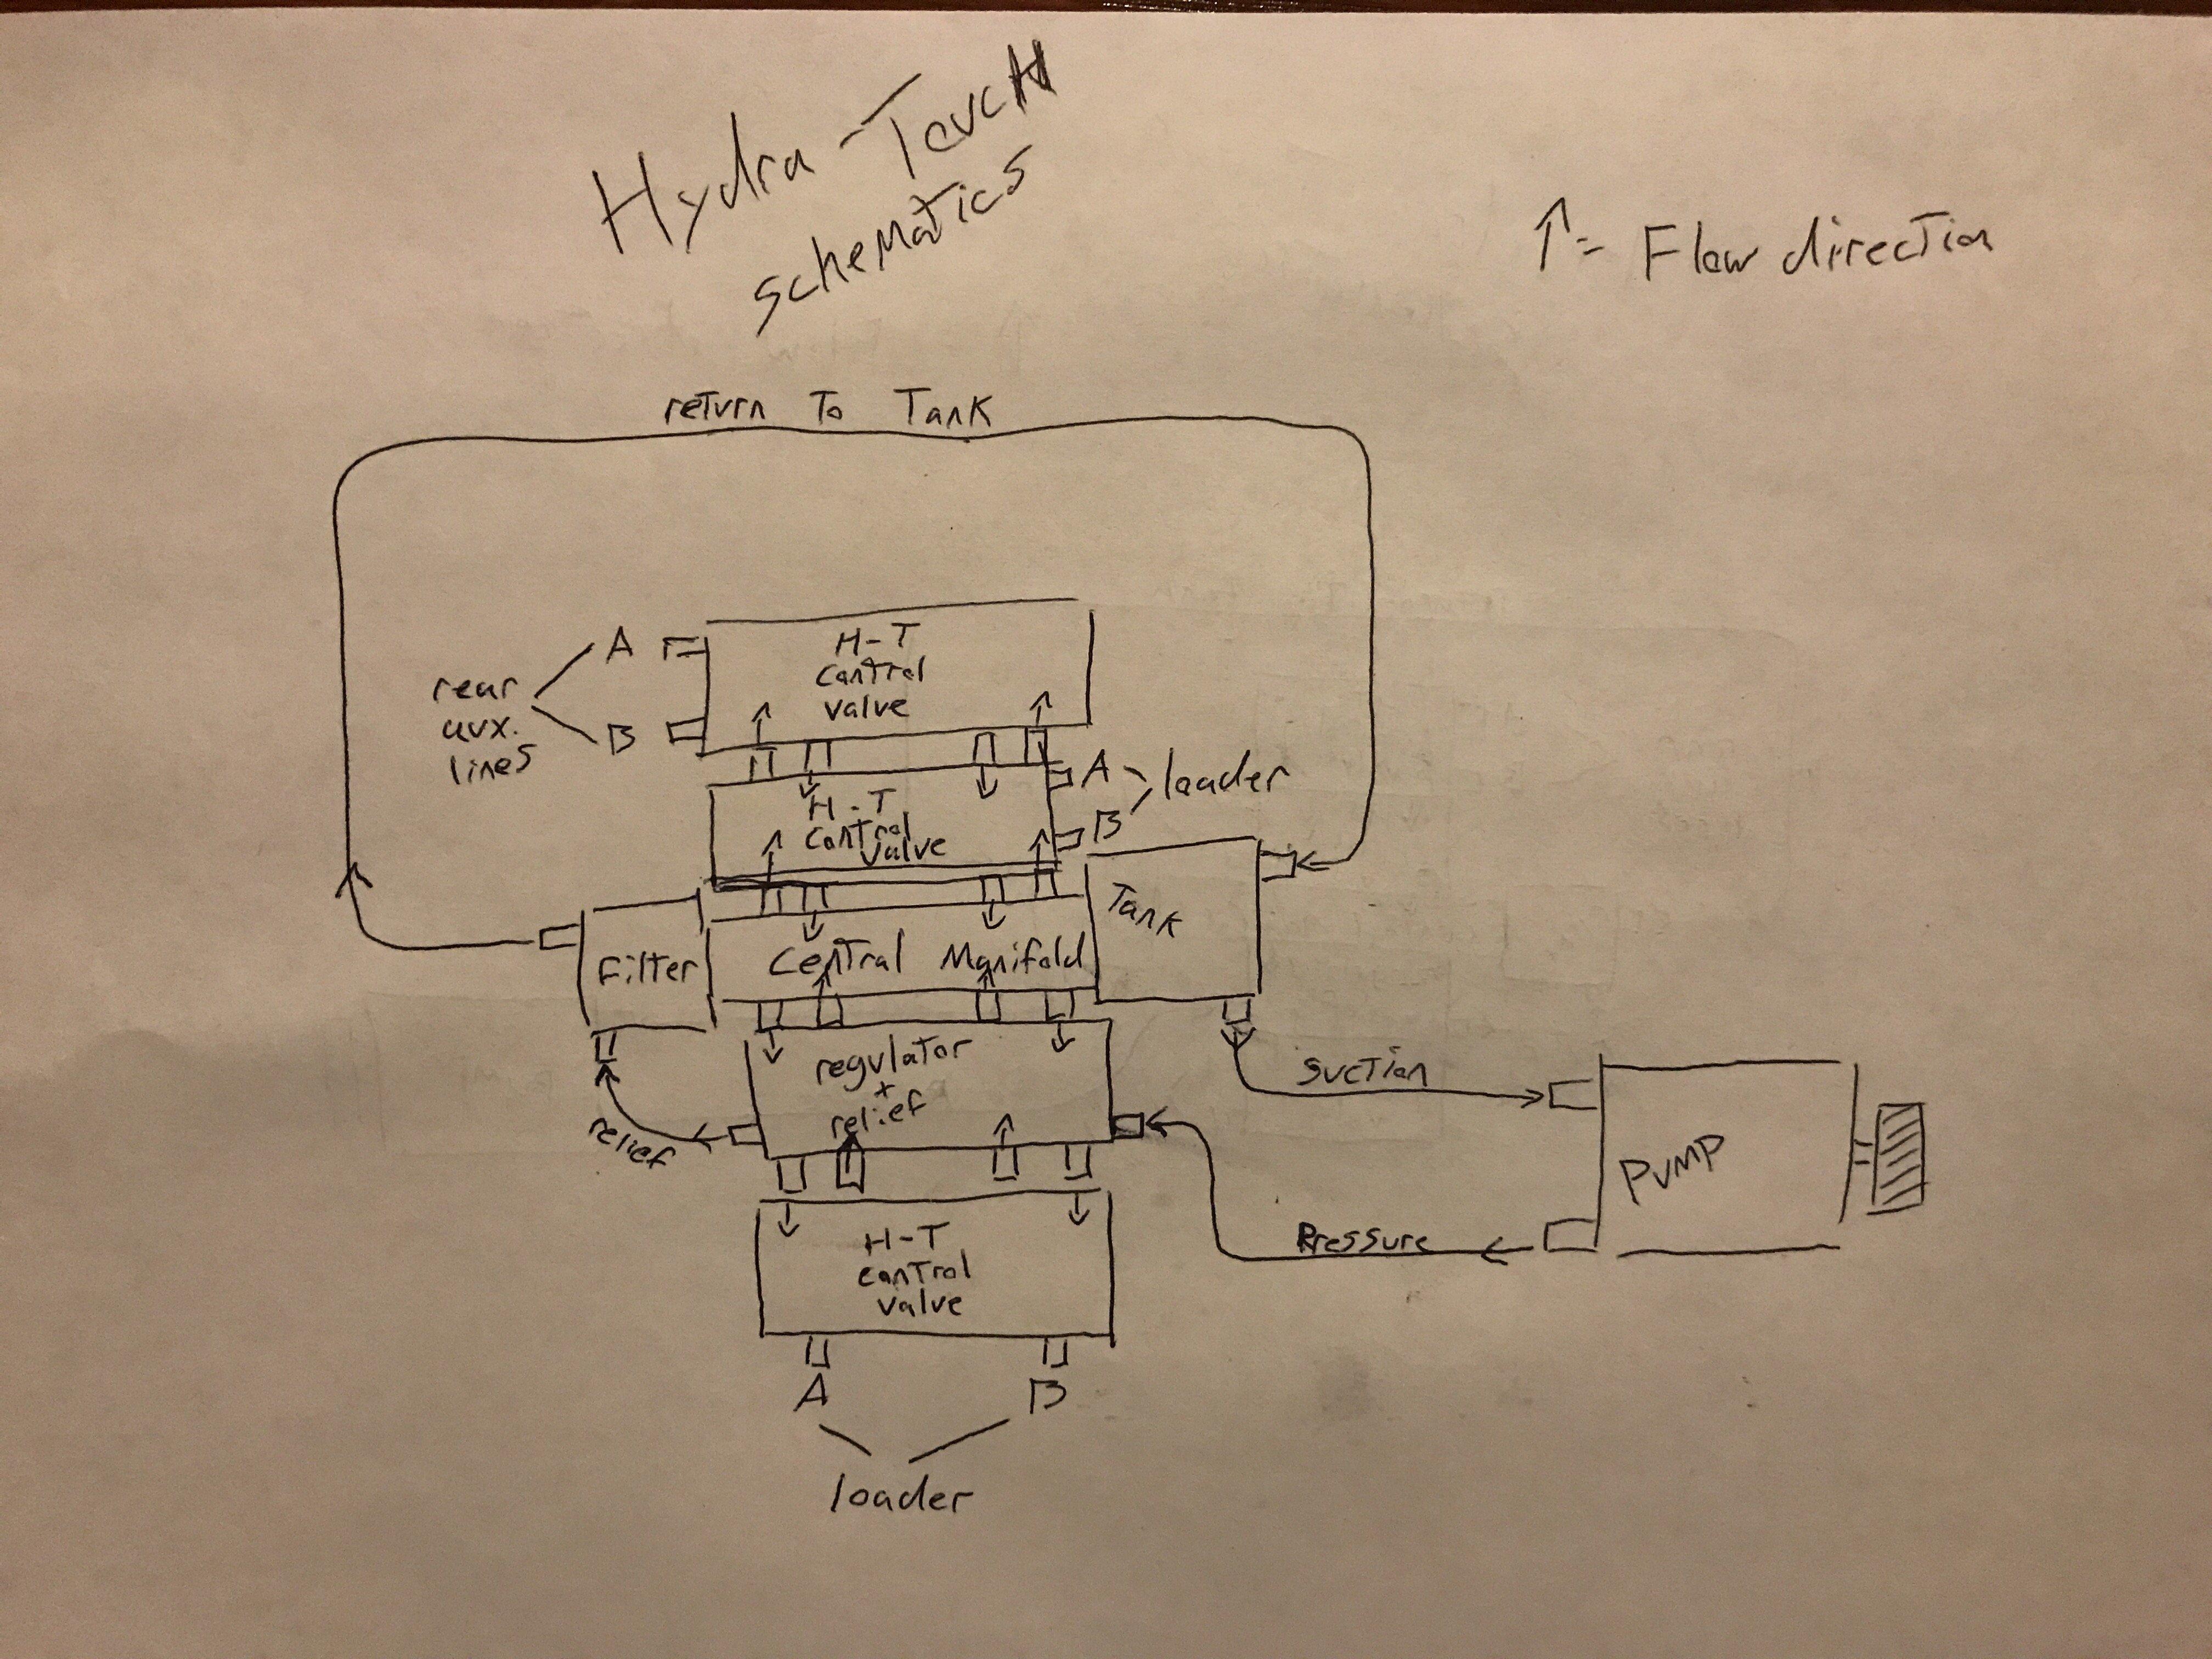 Ih 240 Utility Weak Hydraulics - Page 2 - General Ih